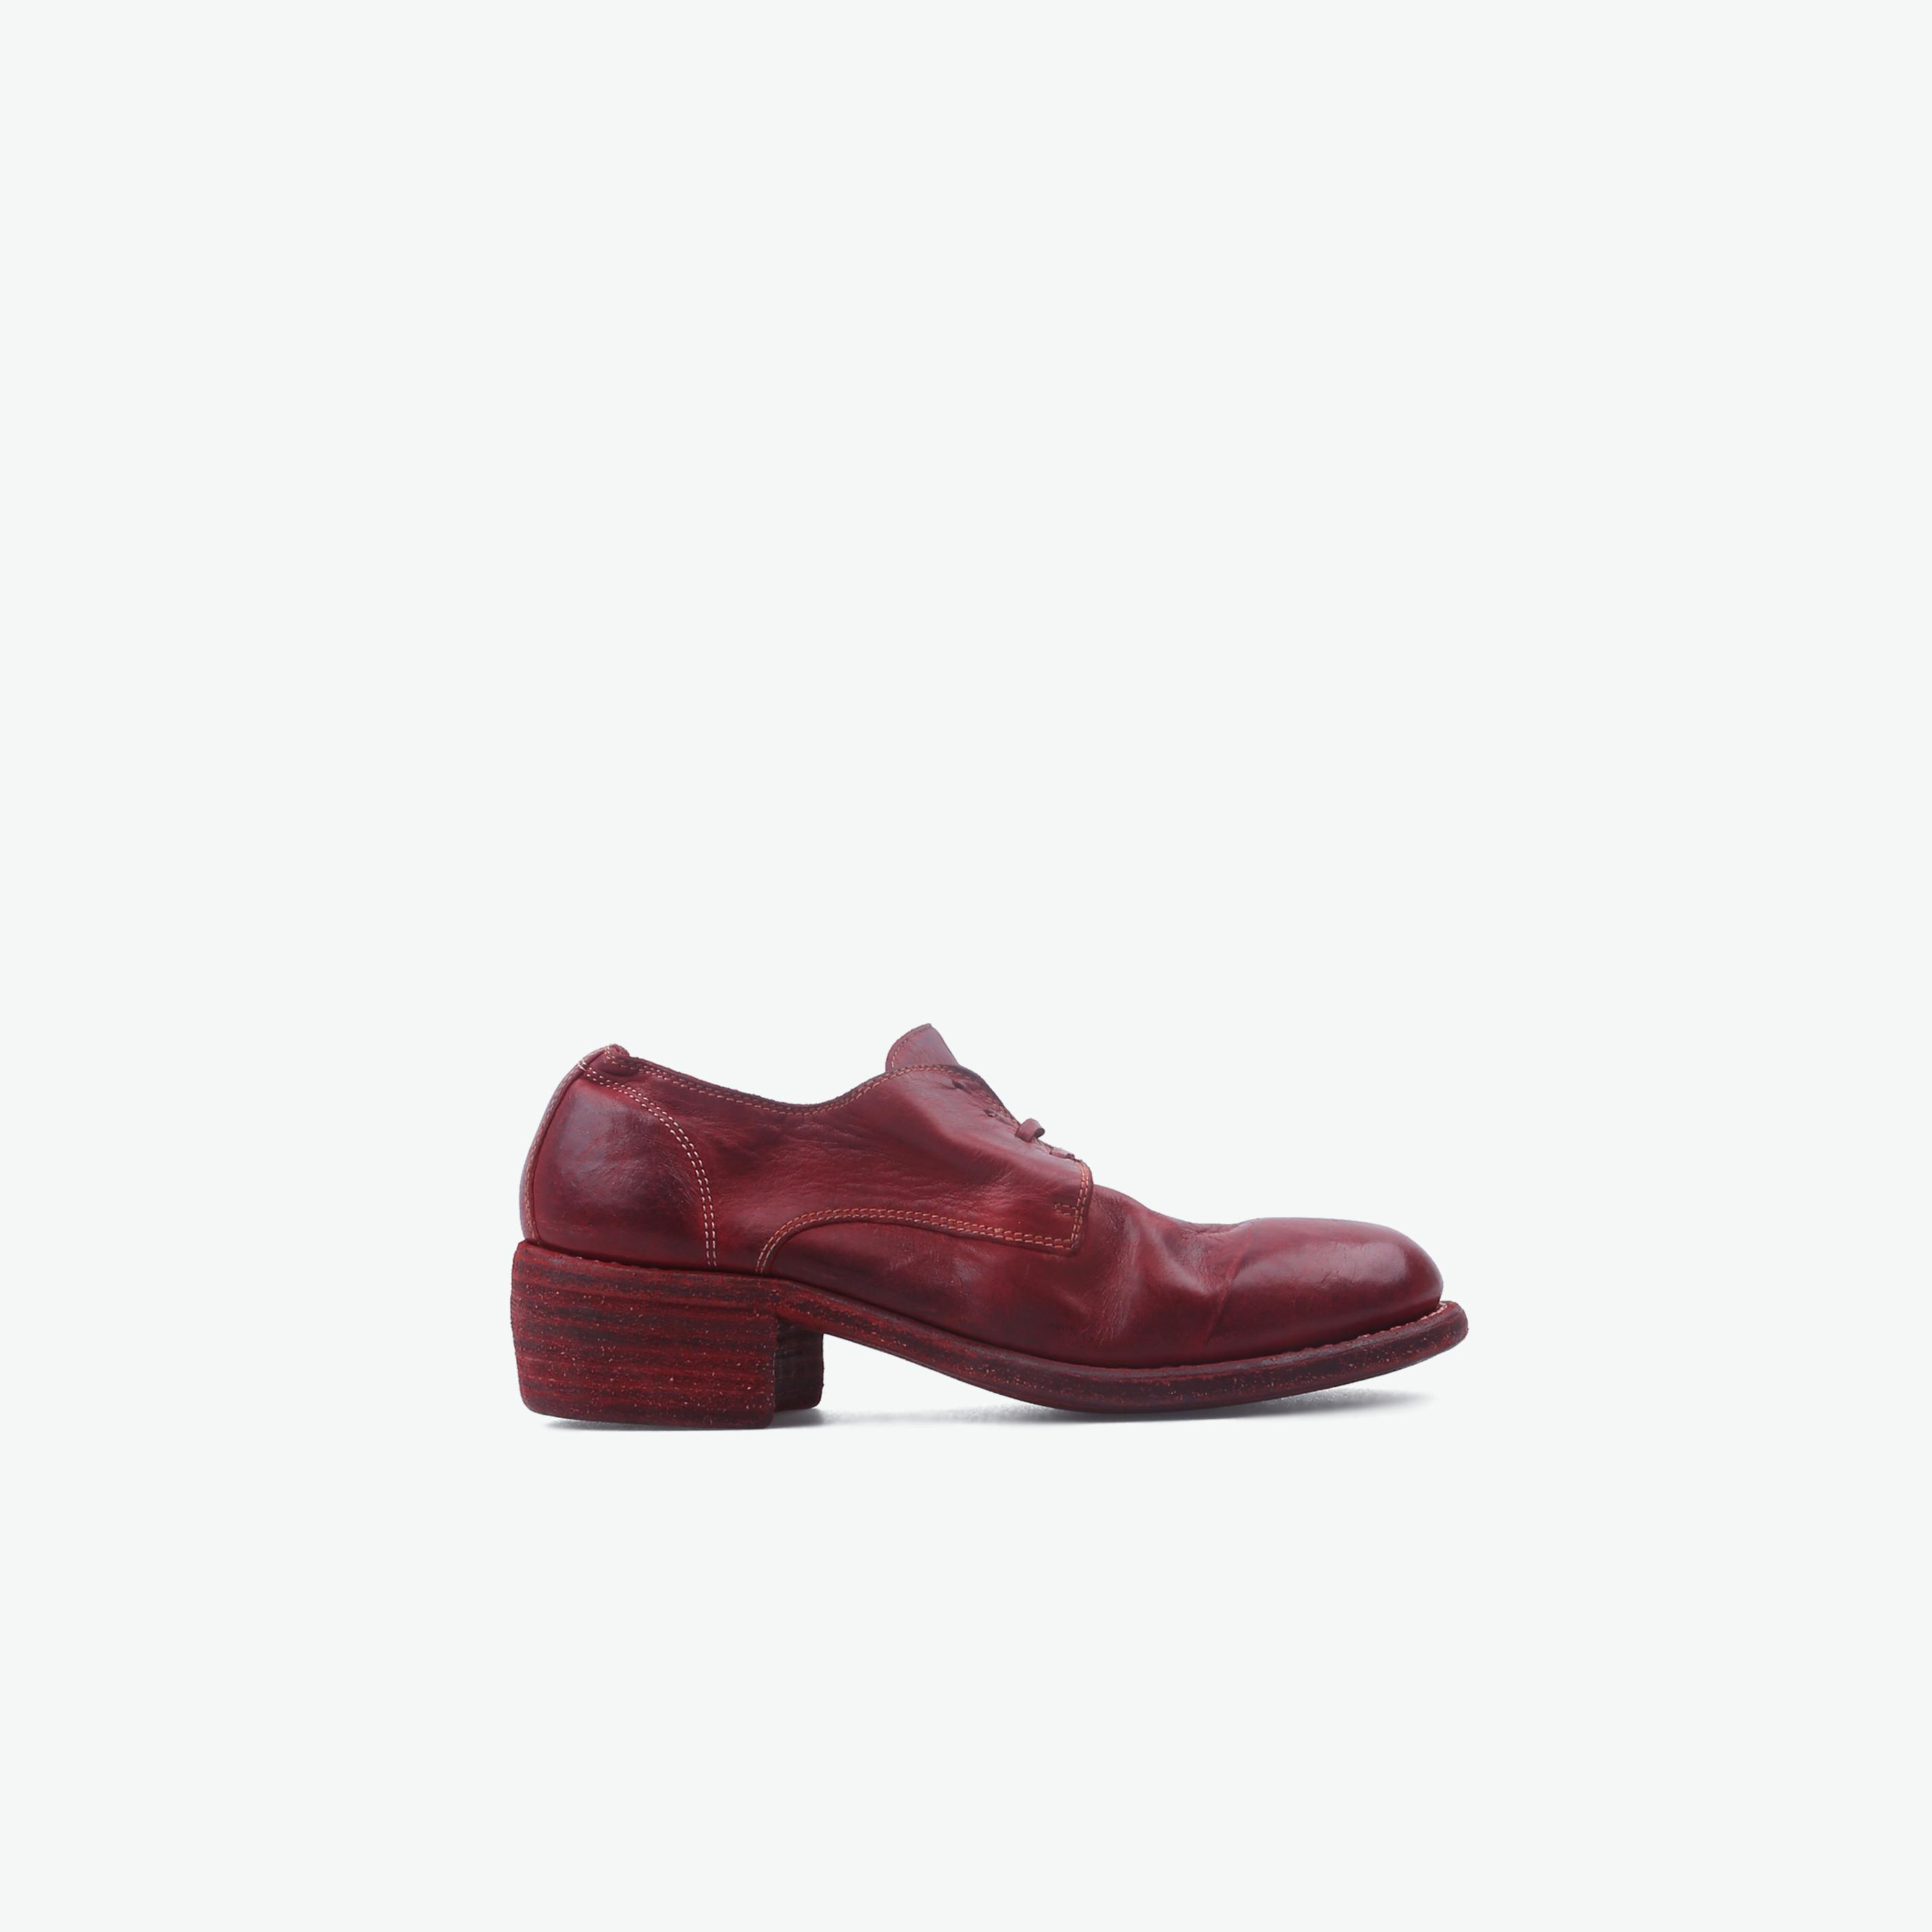 GUIDI酒红色马皮系带792休闲皮鞋792-LINED-1006TRED